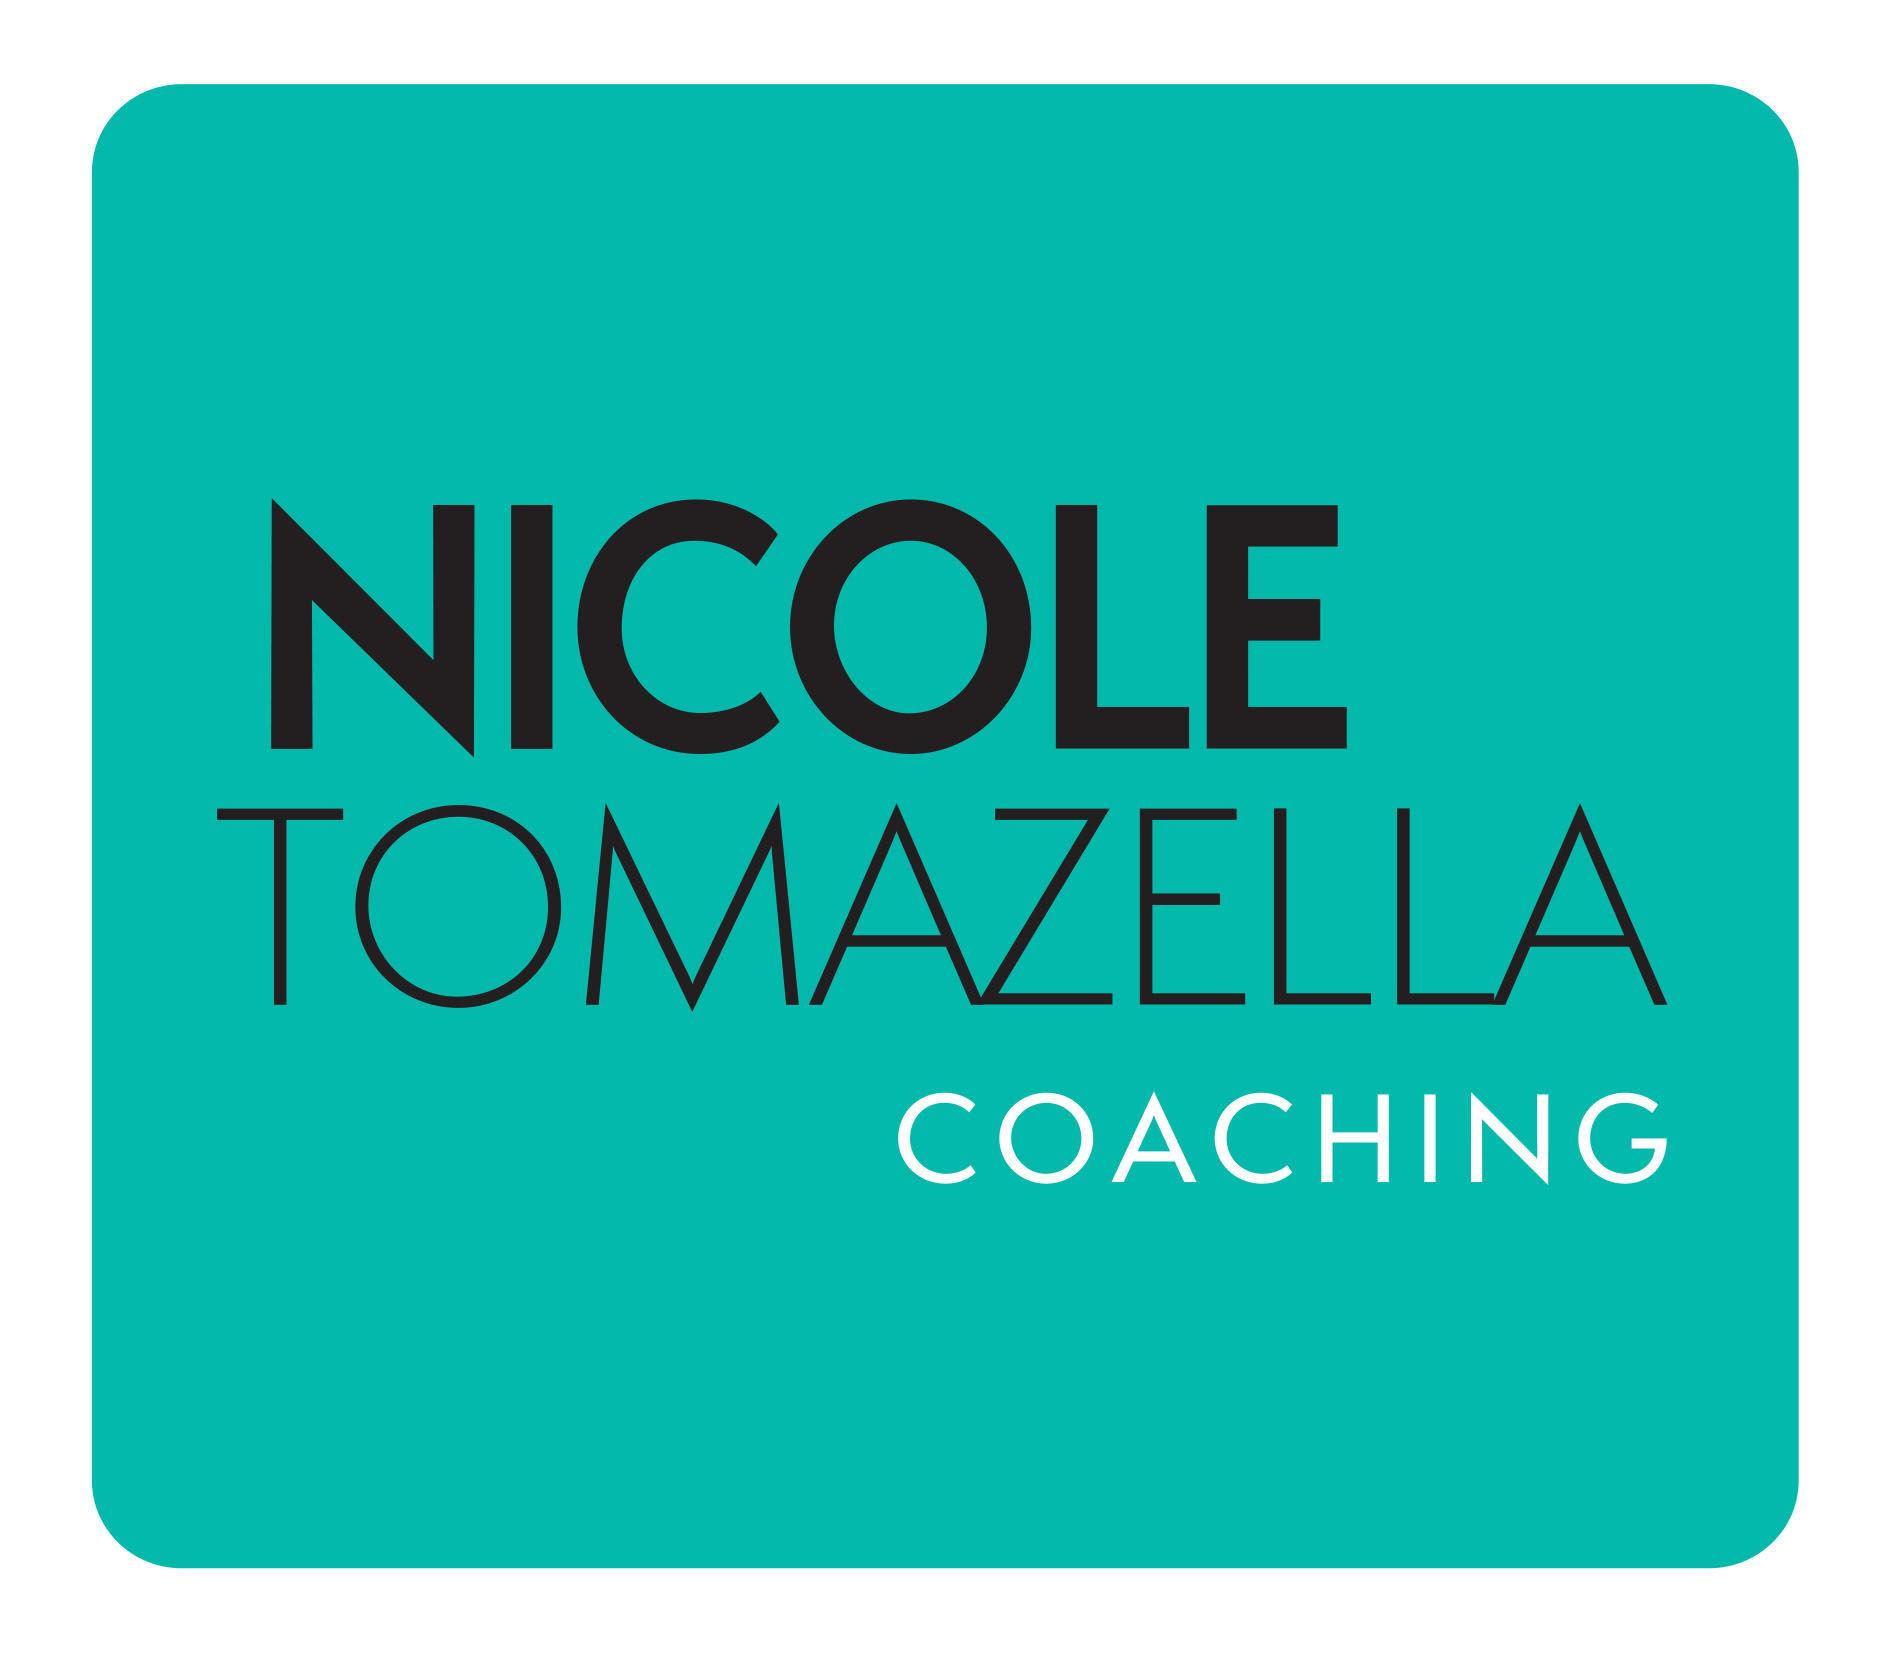 Nicole Tomazella logomarca